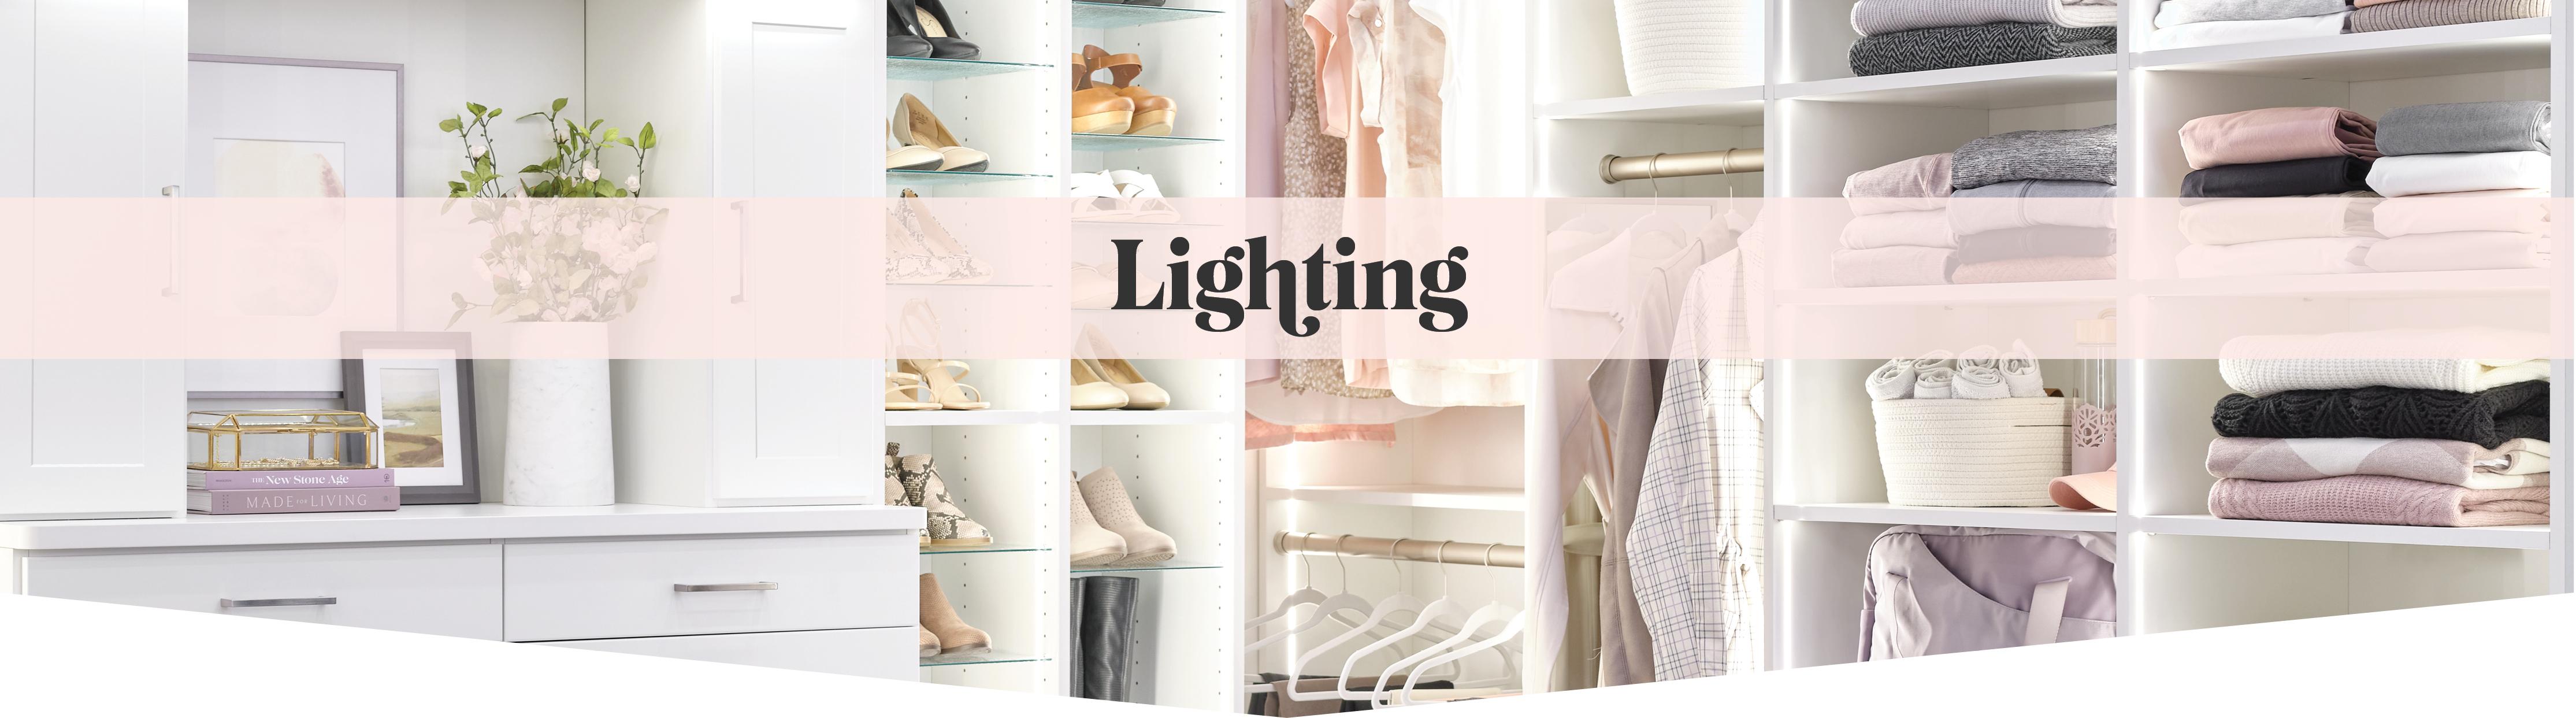 Custom lighting for your custom organization from Inspired Closets